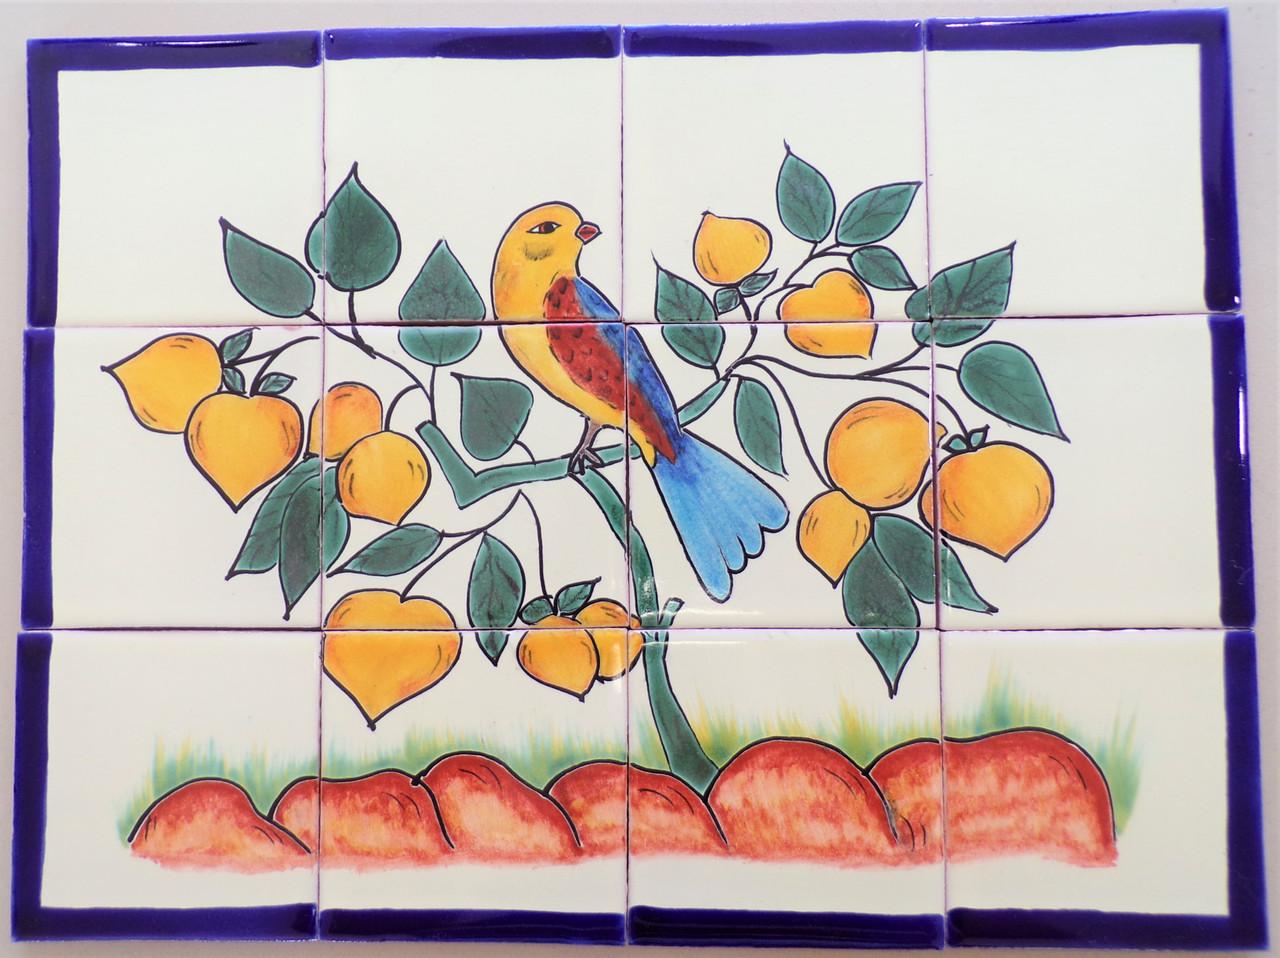 Pajaro Cantor 12 piece 4x4